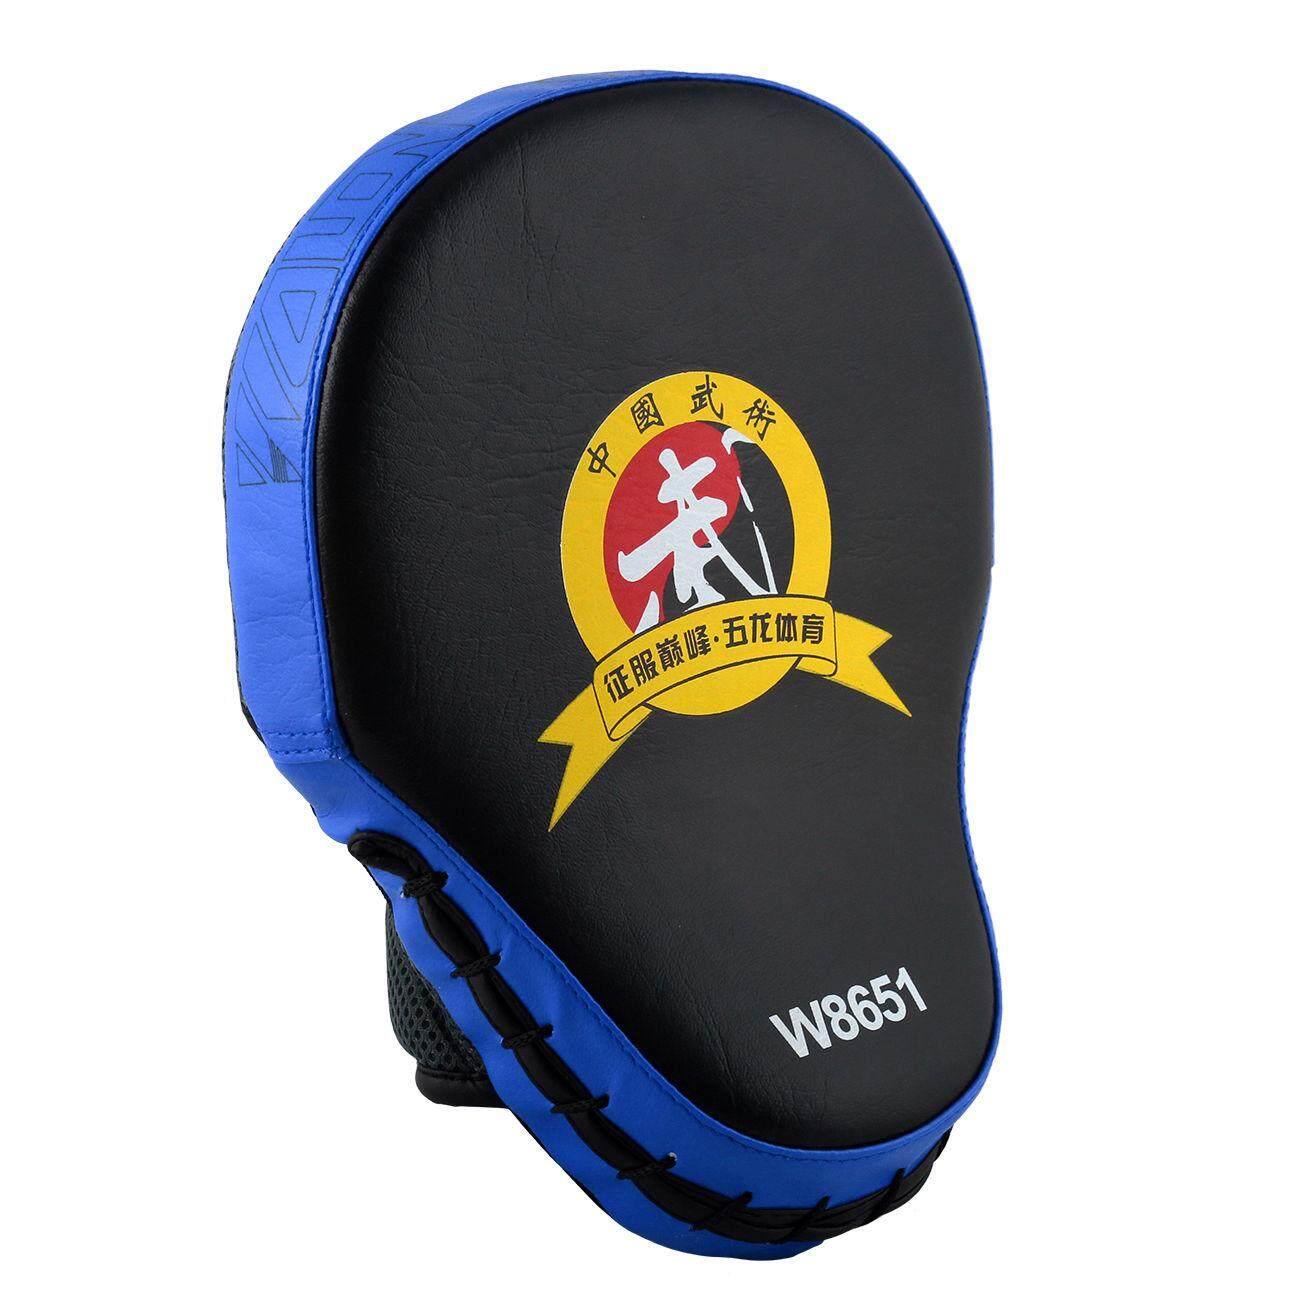 Miracle Shining Thai MMA Training Boxing Mitt Glove Karate TKD Kick Target Punch Pad Blue